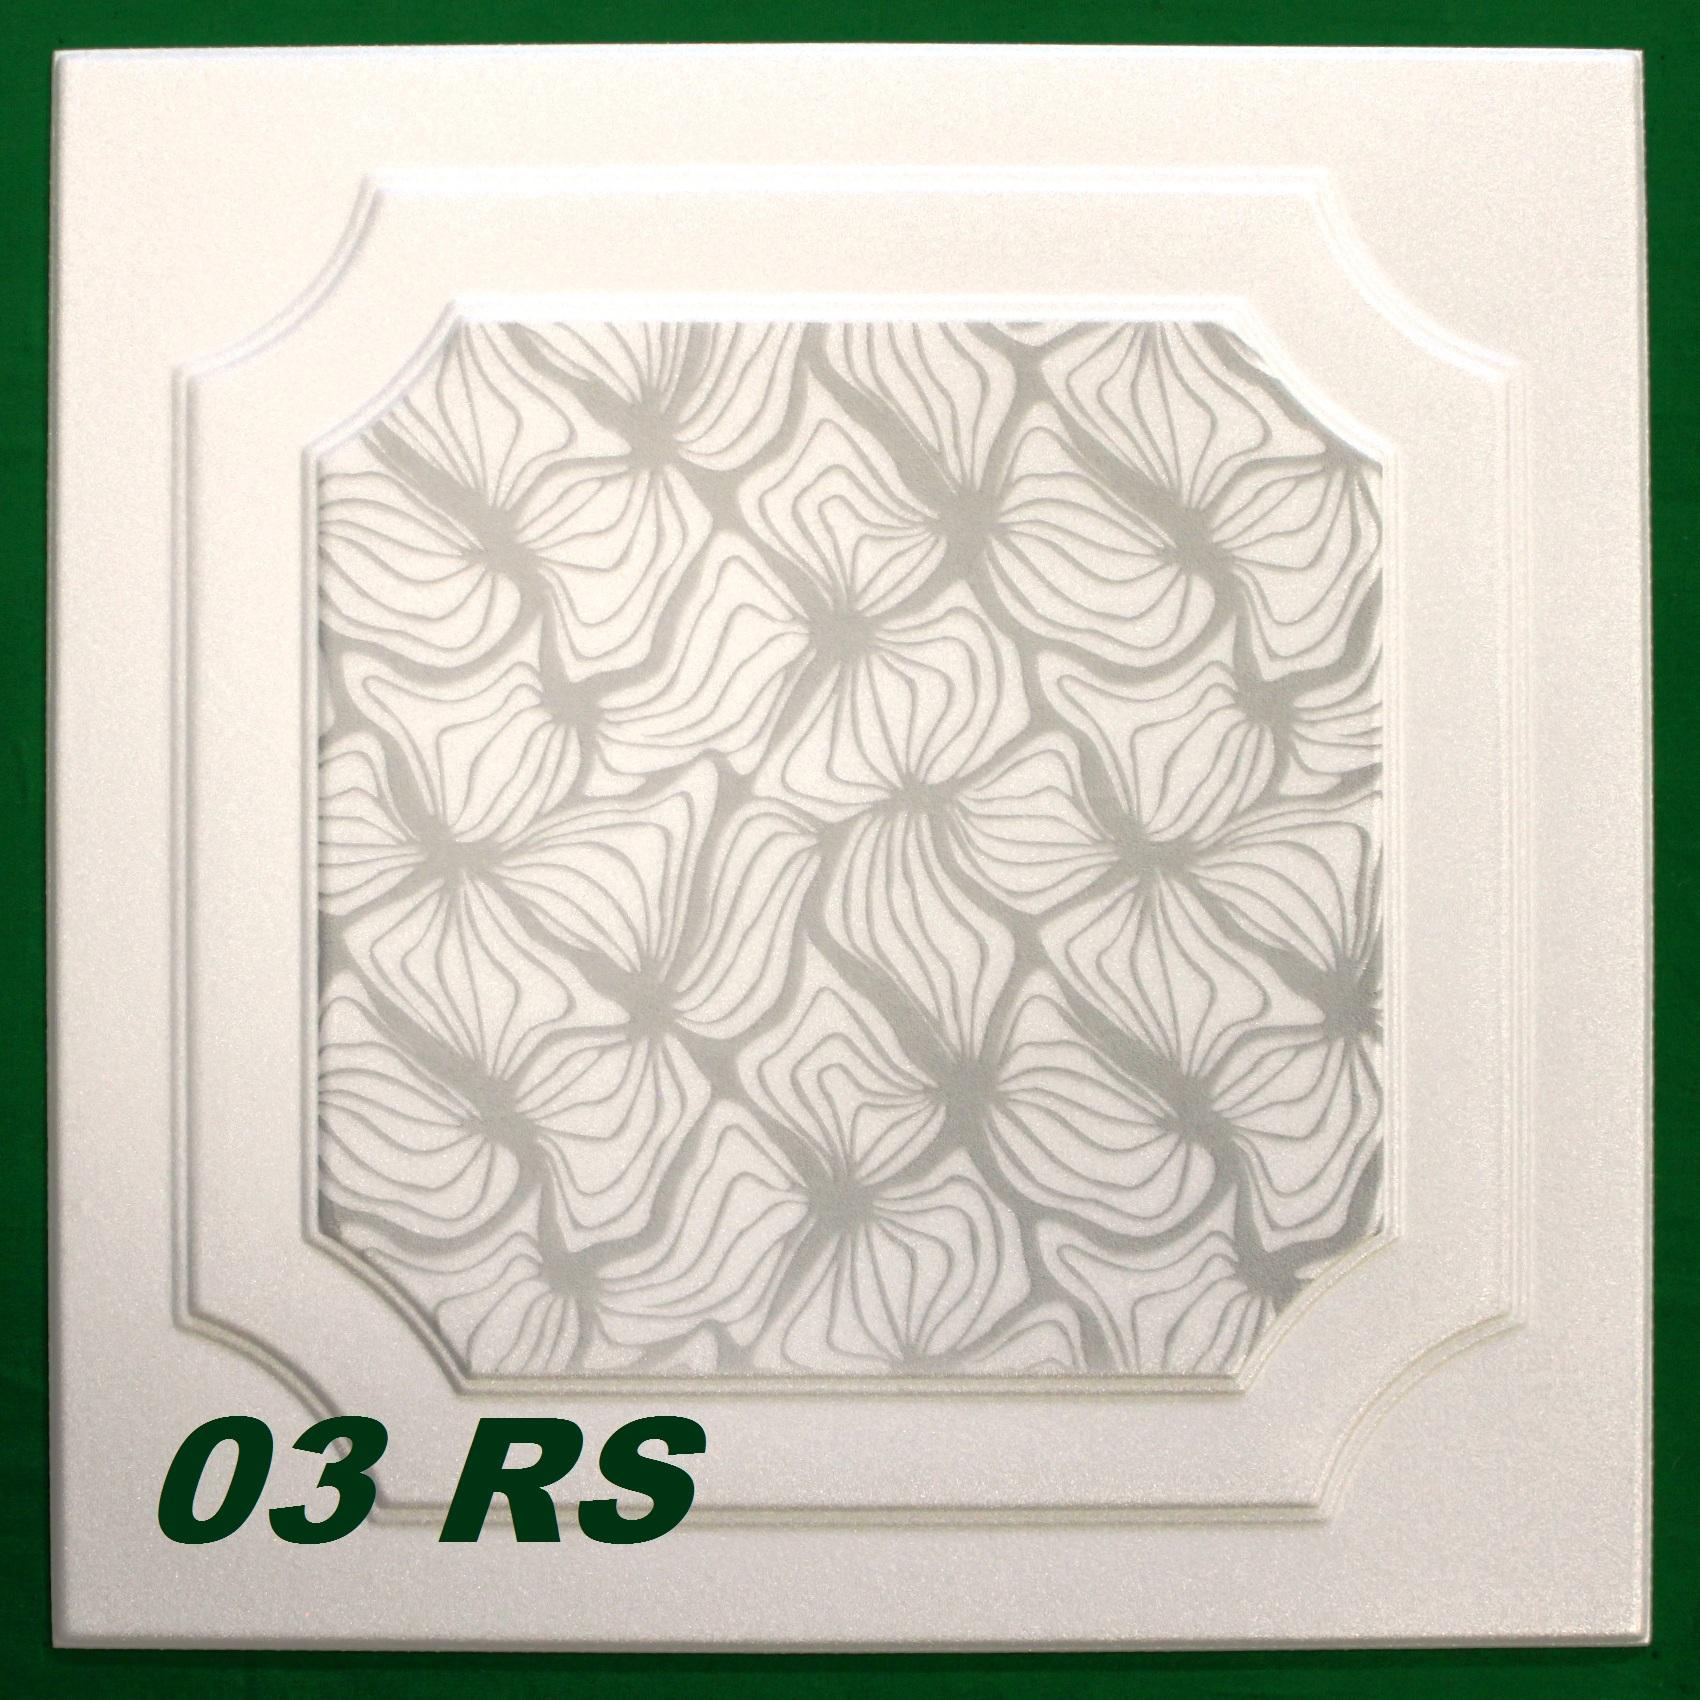 10 m2 deckenplatten styroporplatten stuck farbige platten 50x50cm rs ebay. Black Bedroom Furniture Sets. Home Design Ideas